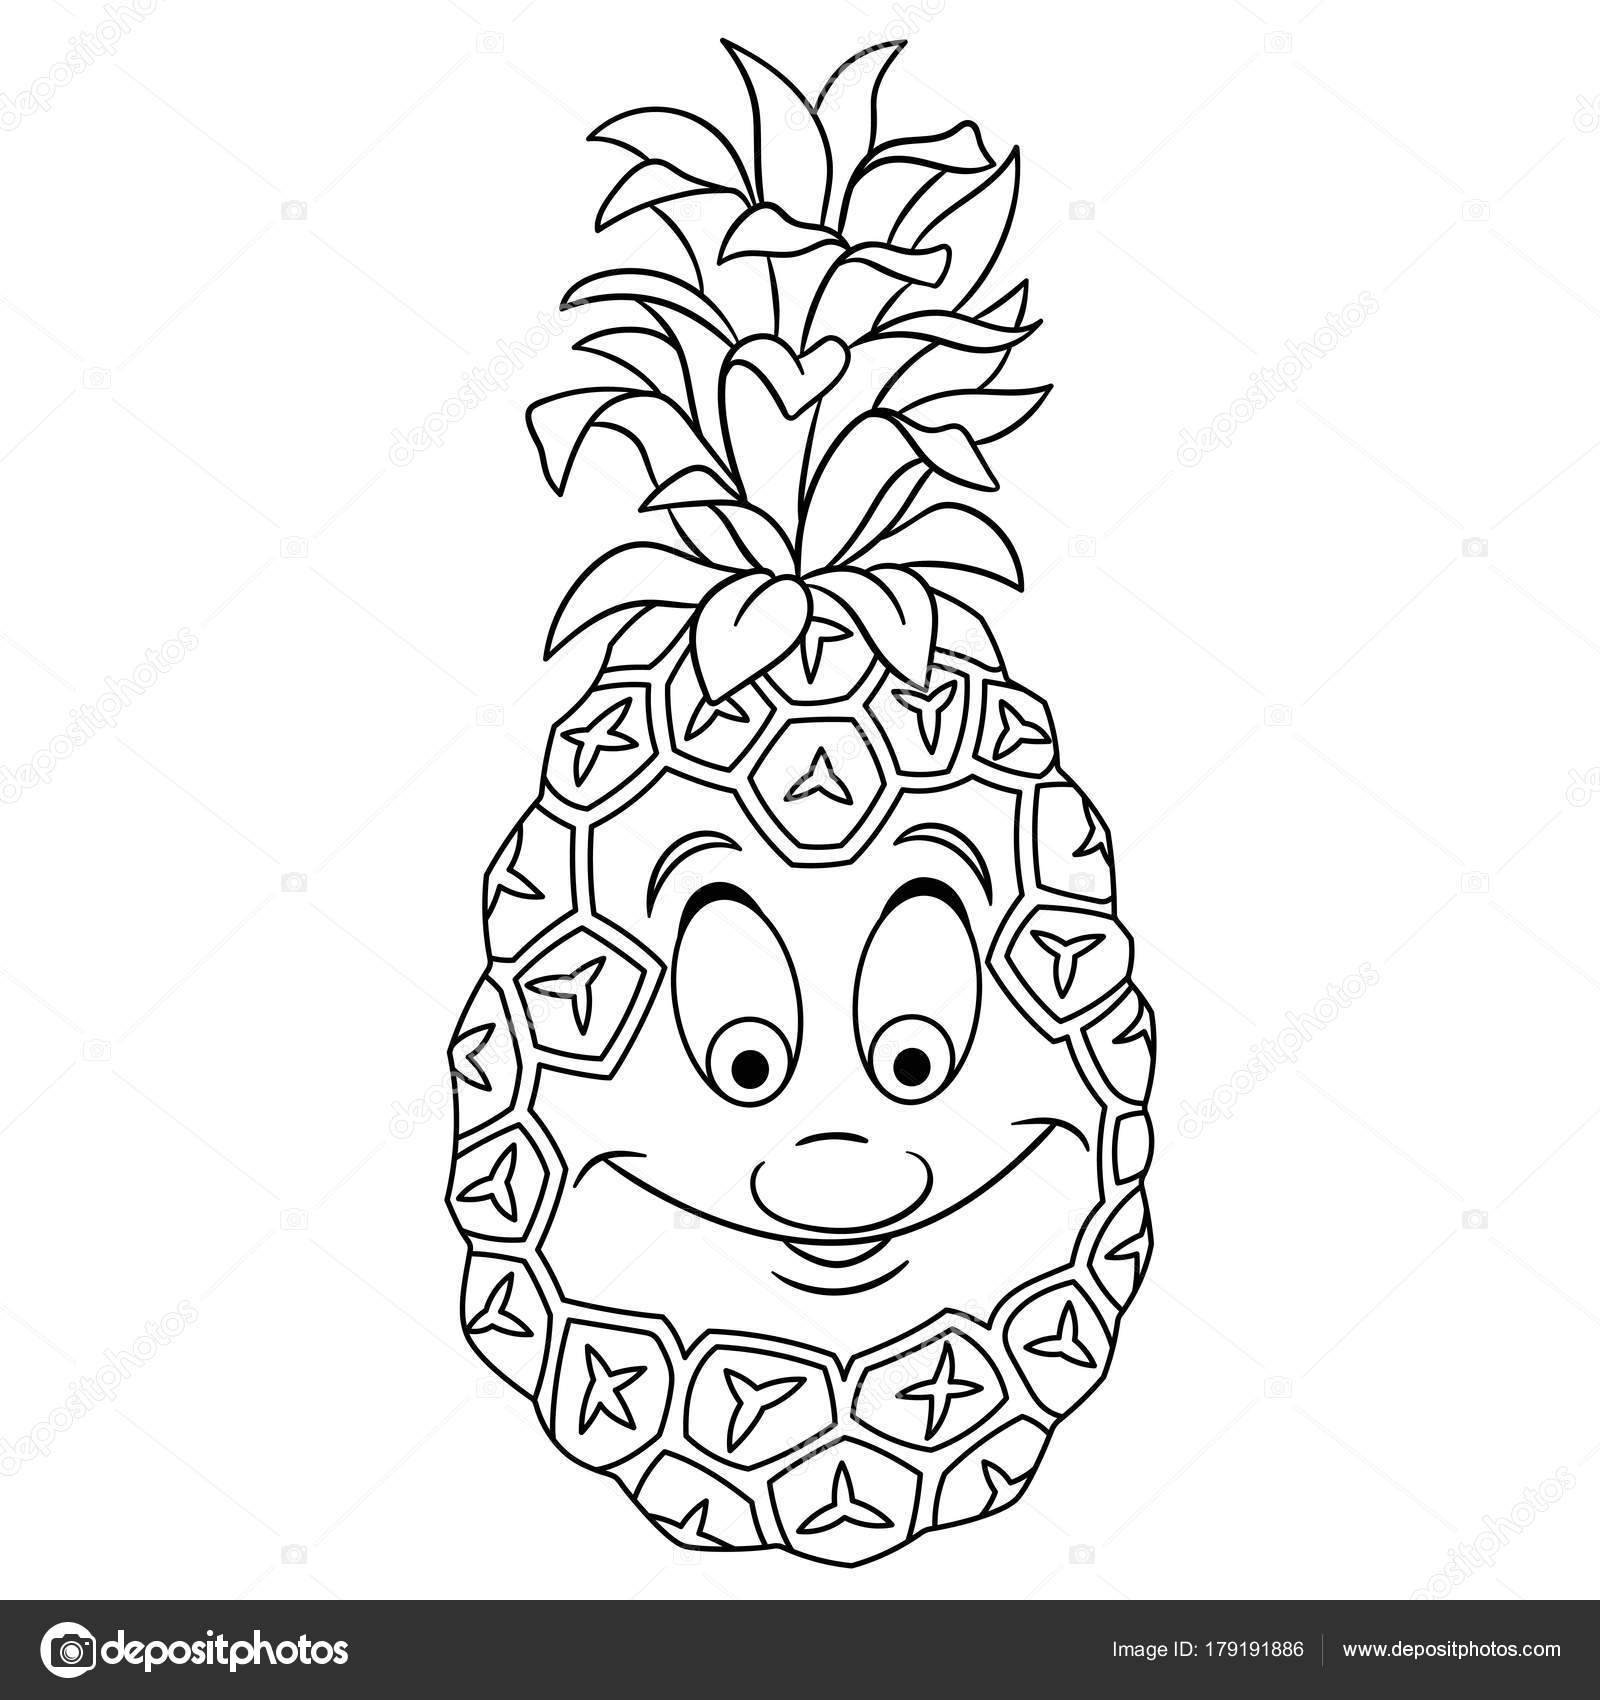 kleurplaat ananas peuter kleurplatenl